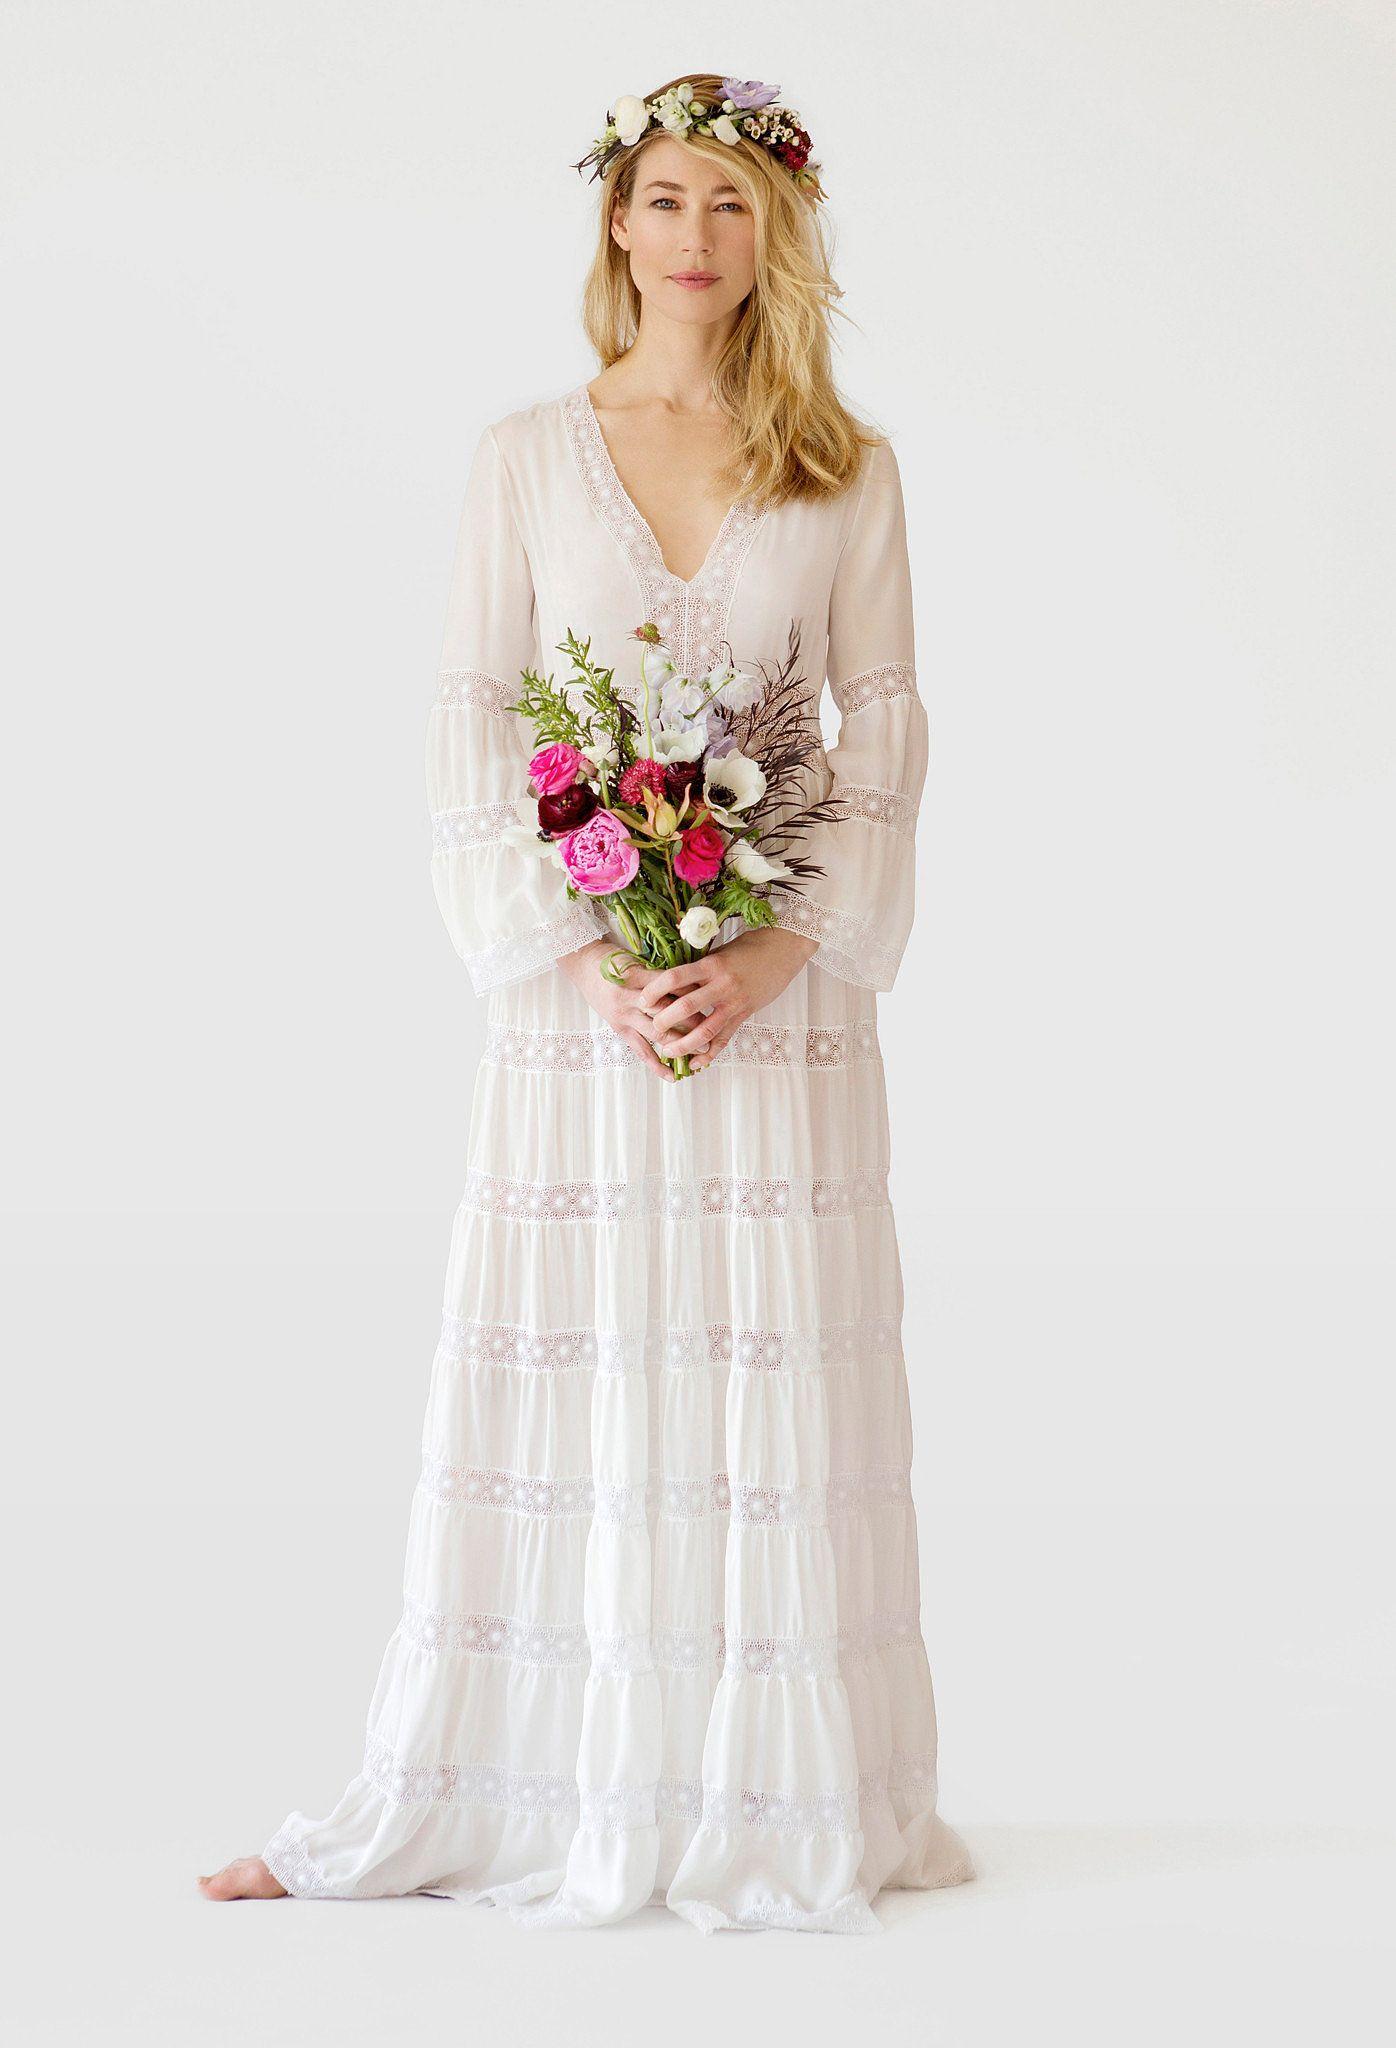 Bell Sleeves Wedding Dresses Hippie Outdoor Wedding Dress Trendy Wedding Dresses